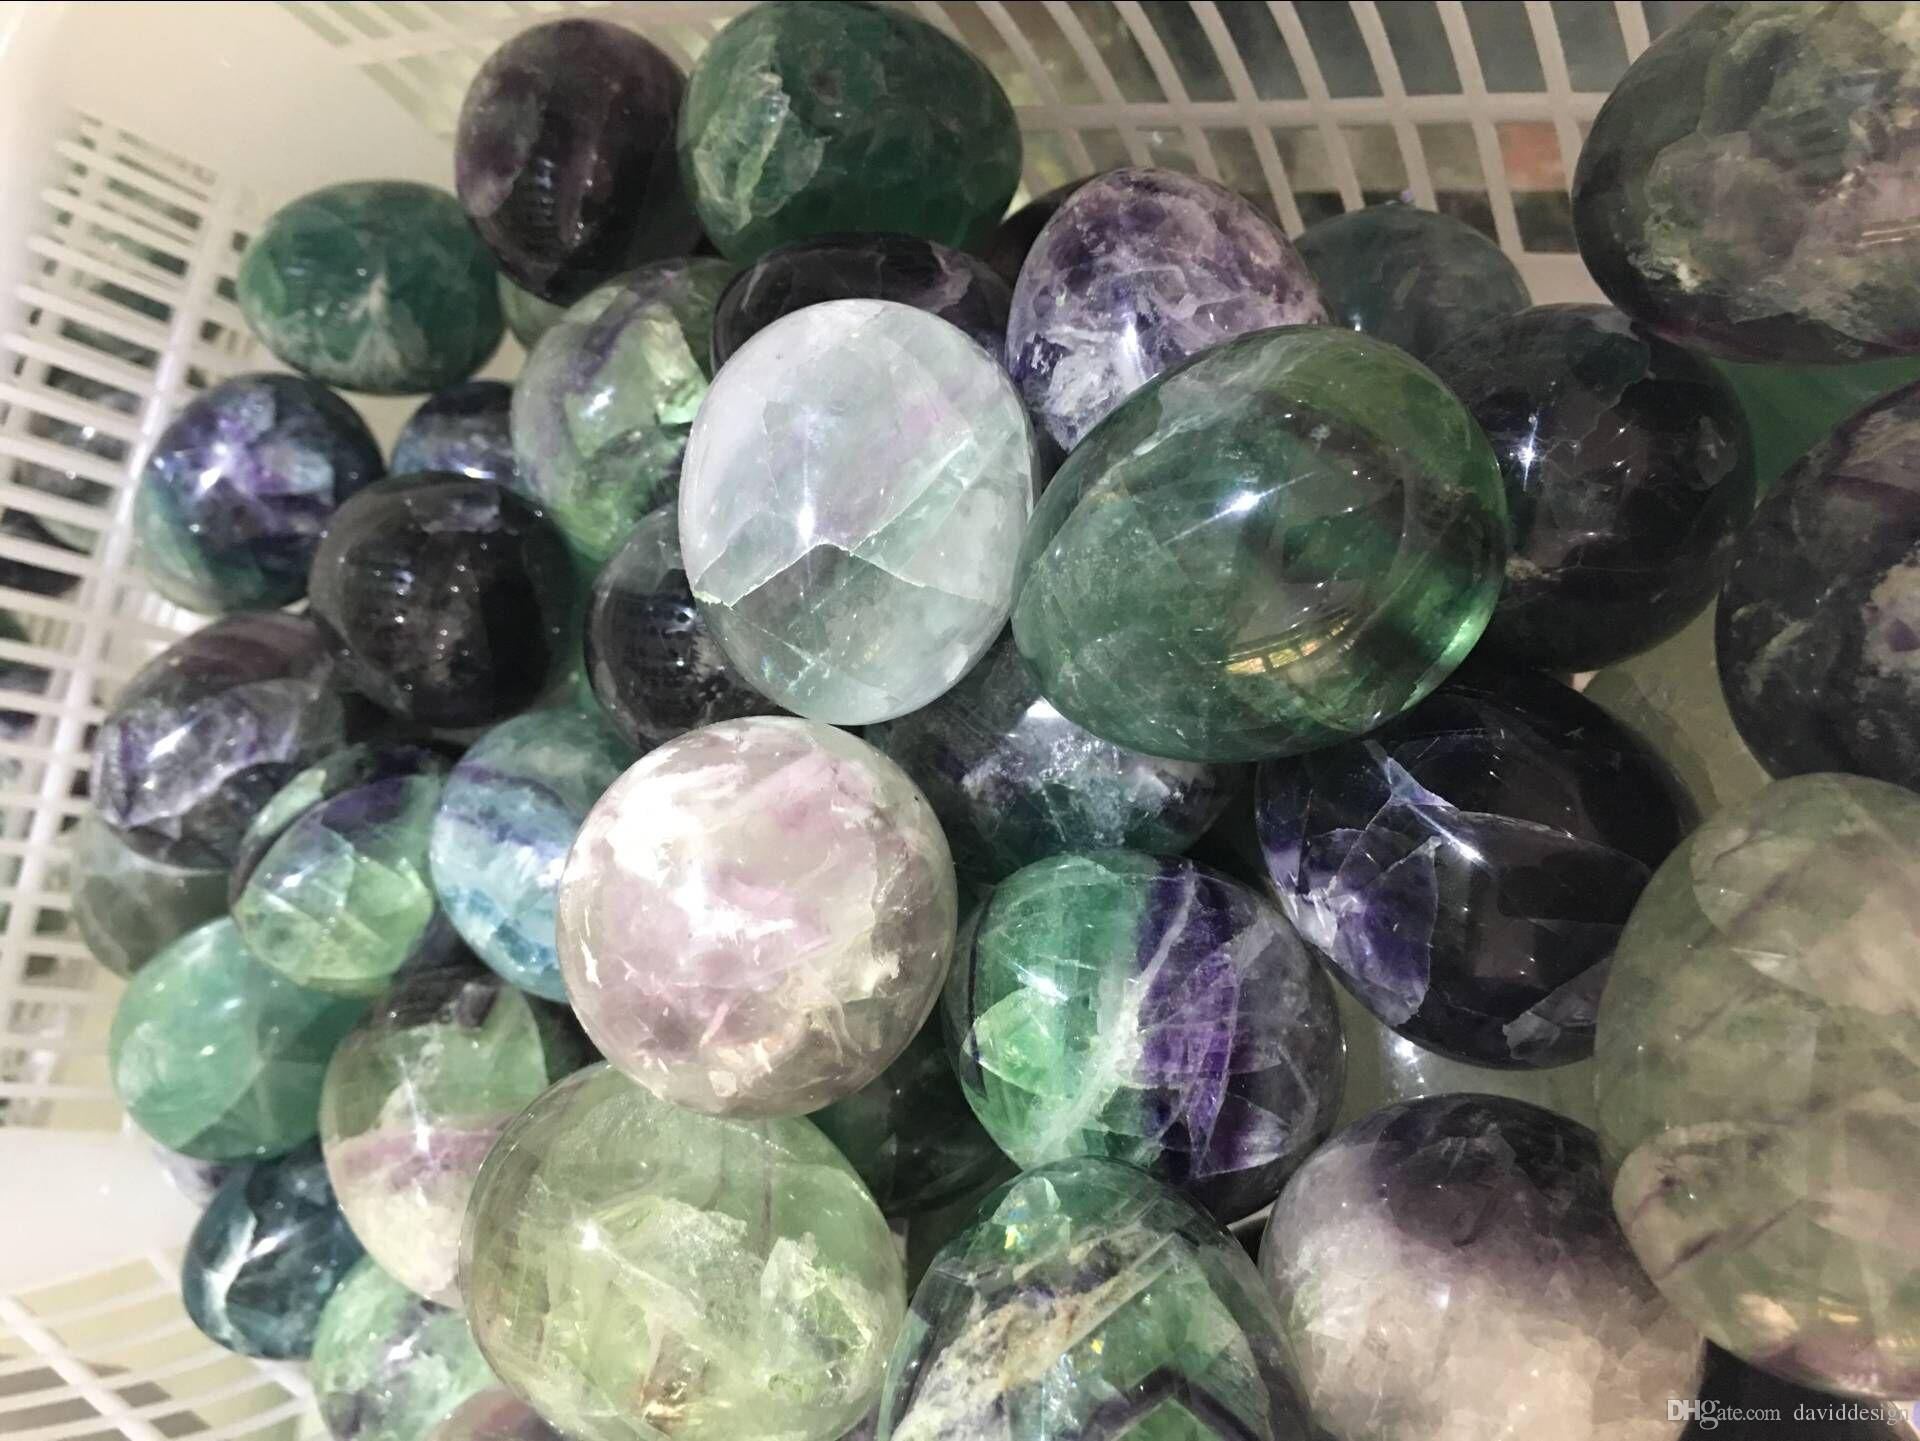 3 PCs Dropshipping Beautiful Natural Fluorite quartz crystal egg natural  gemstone crystal yoni egg reiki healing free shipping